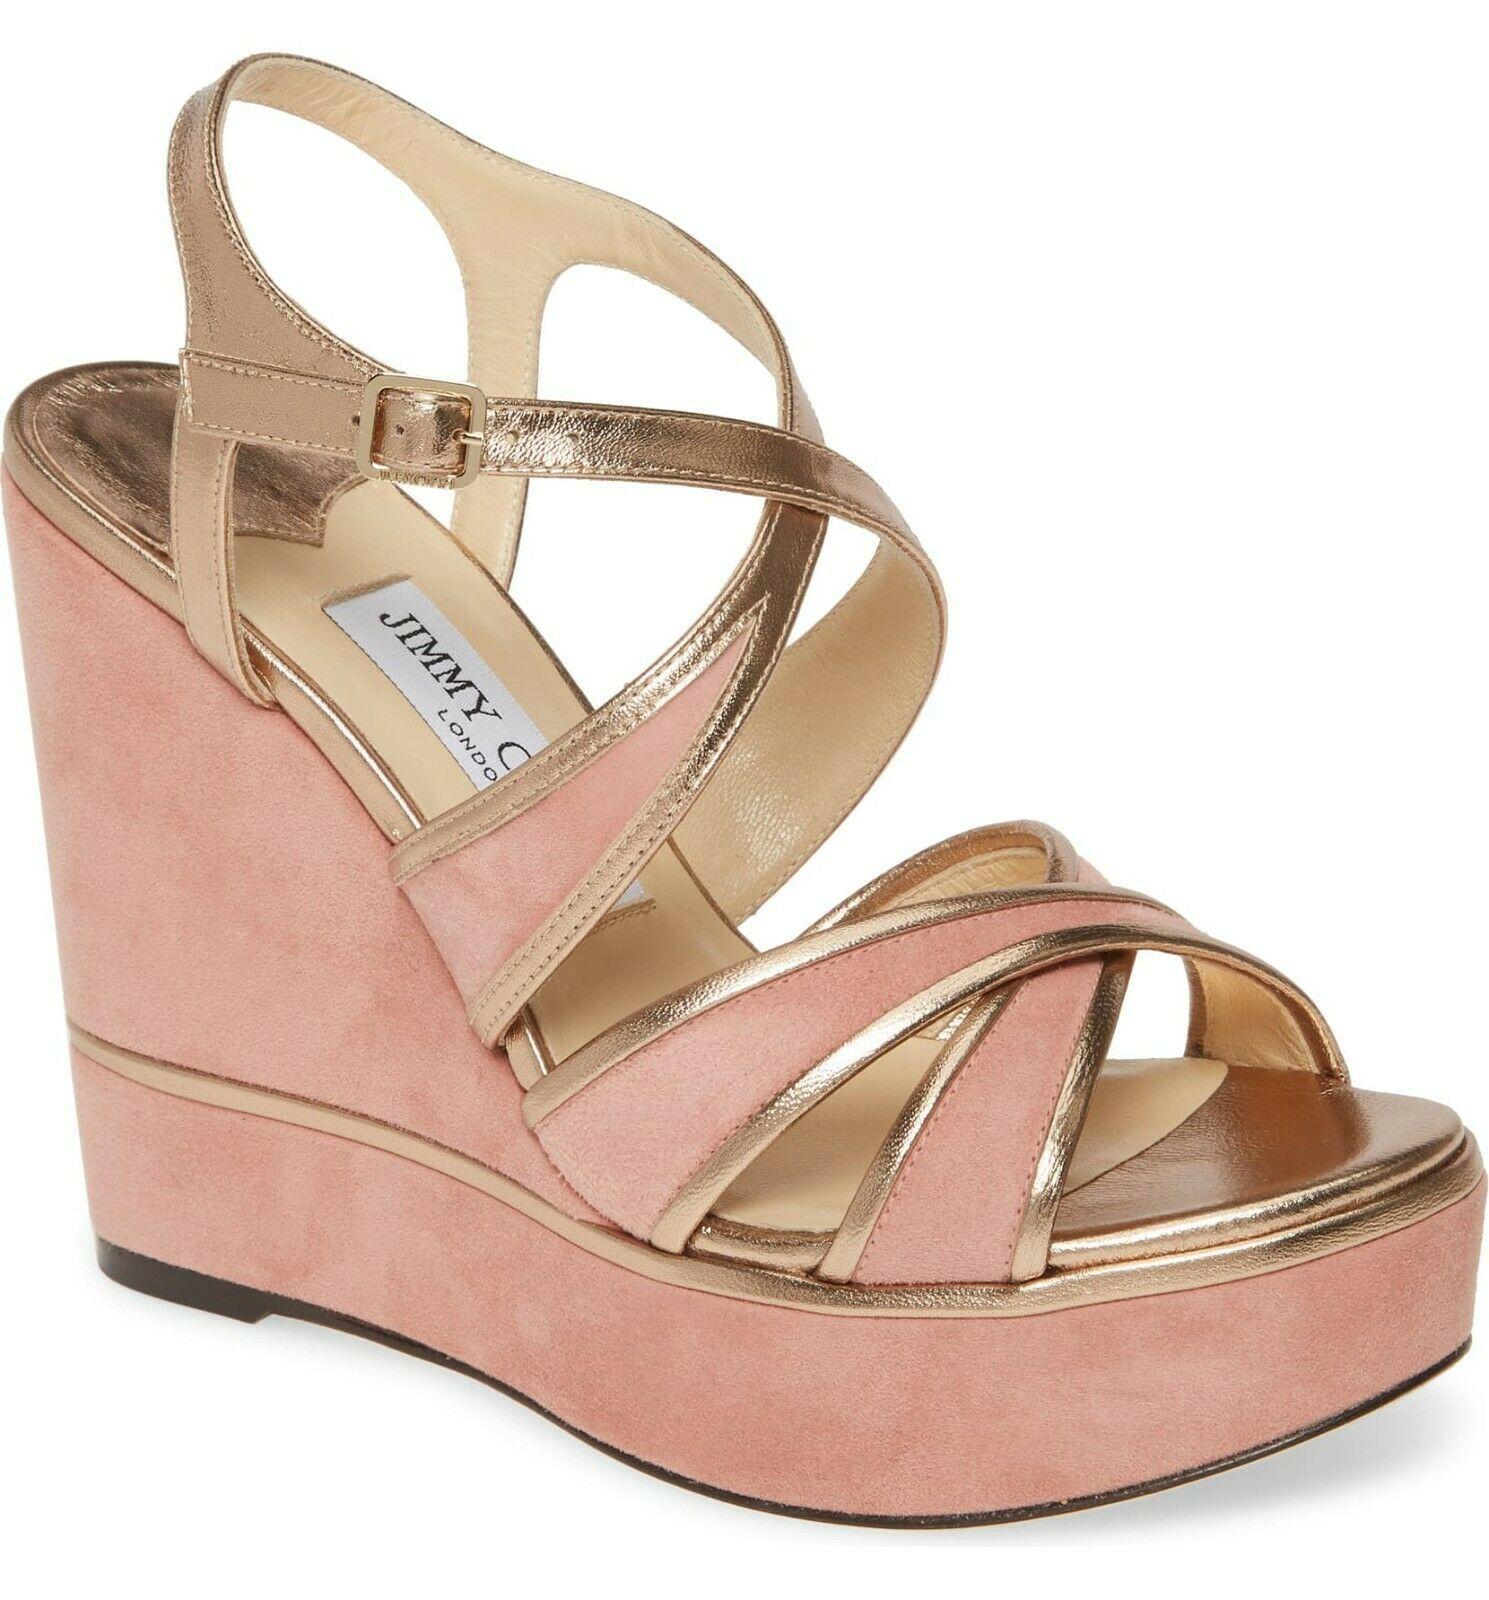 Jimmy Choo Alissa Platform Wedge Sandals Size 37.5 MSRP: $595.00 - $356.40